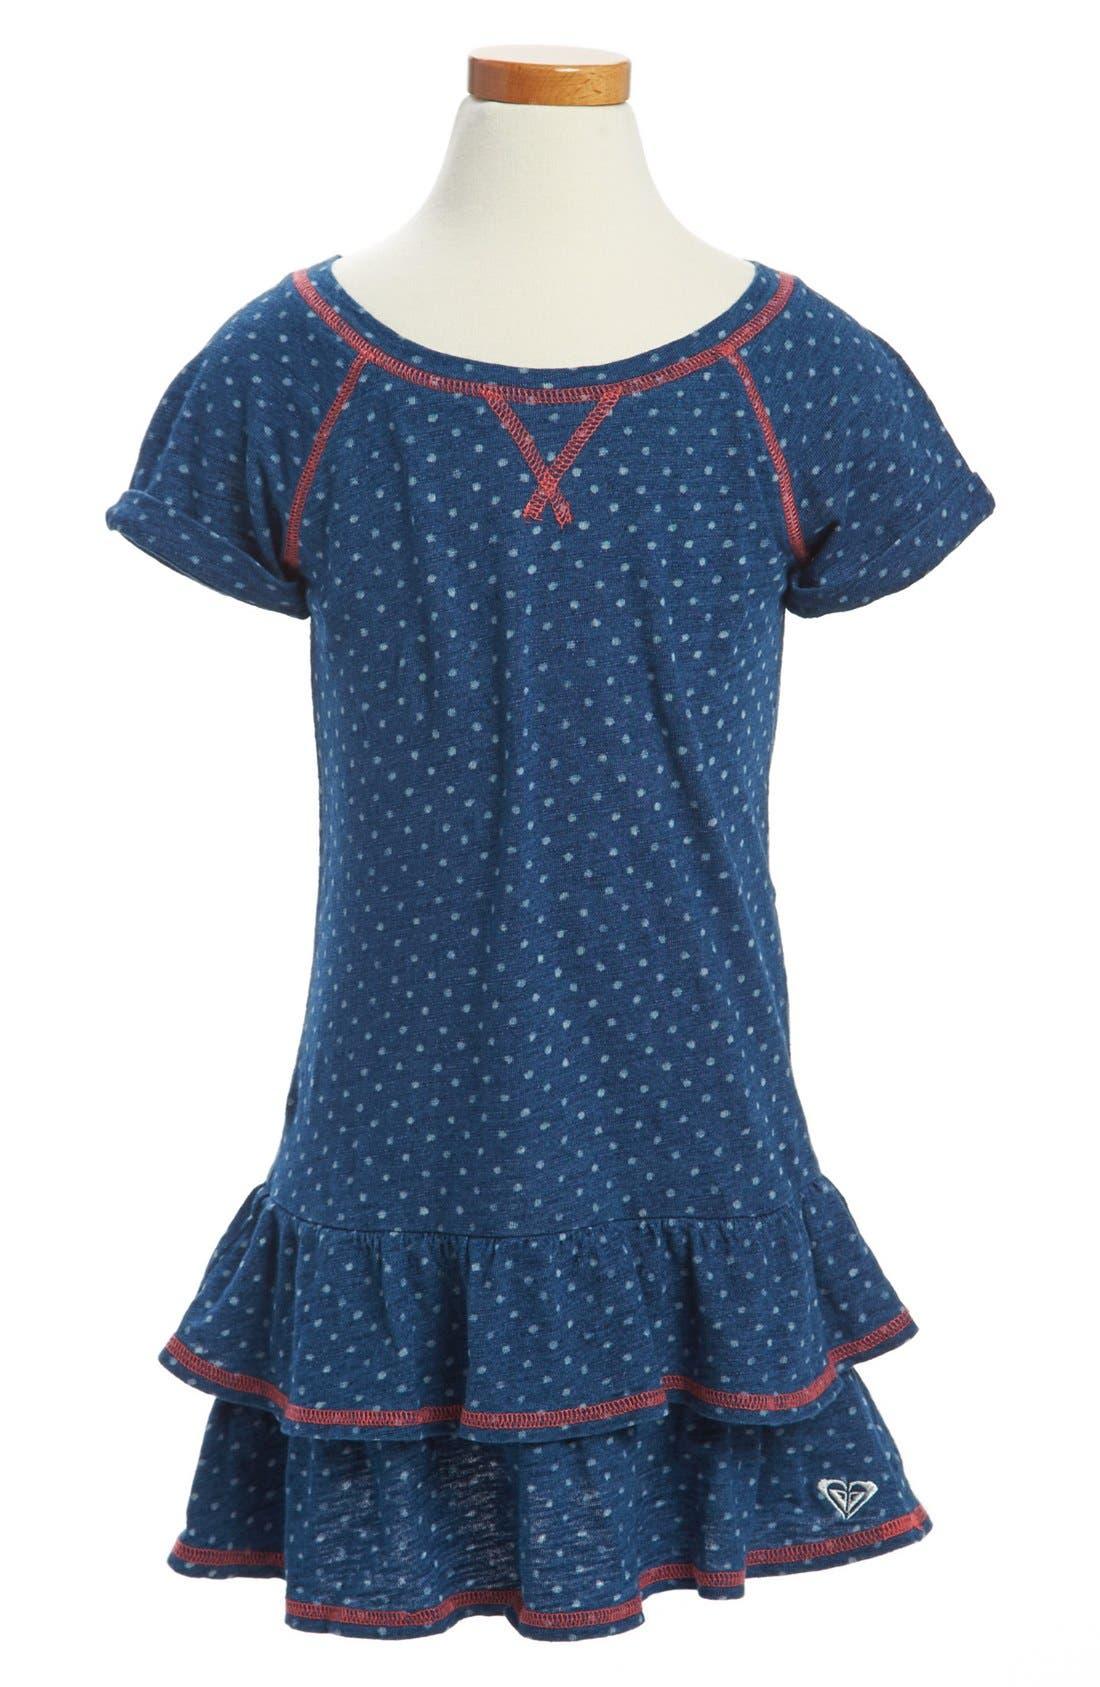 Alternate Image 1 Selected - Roxy 'Fall Limit' Dress (Toddler Girls)